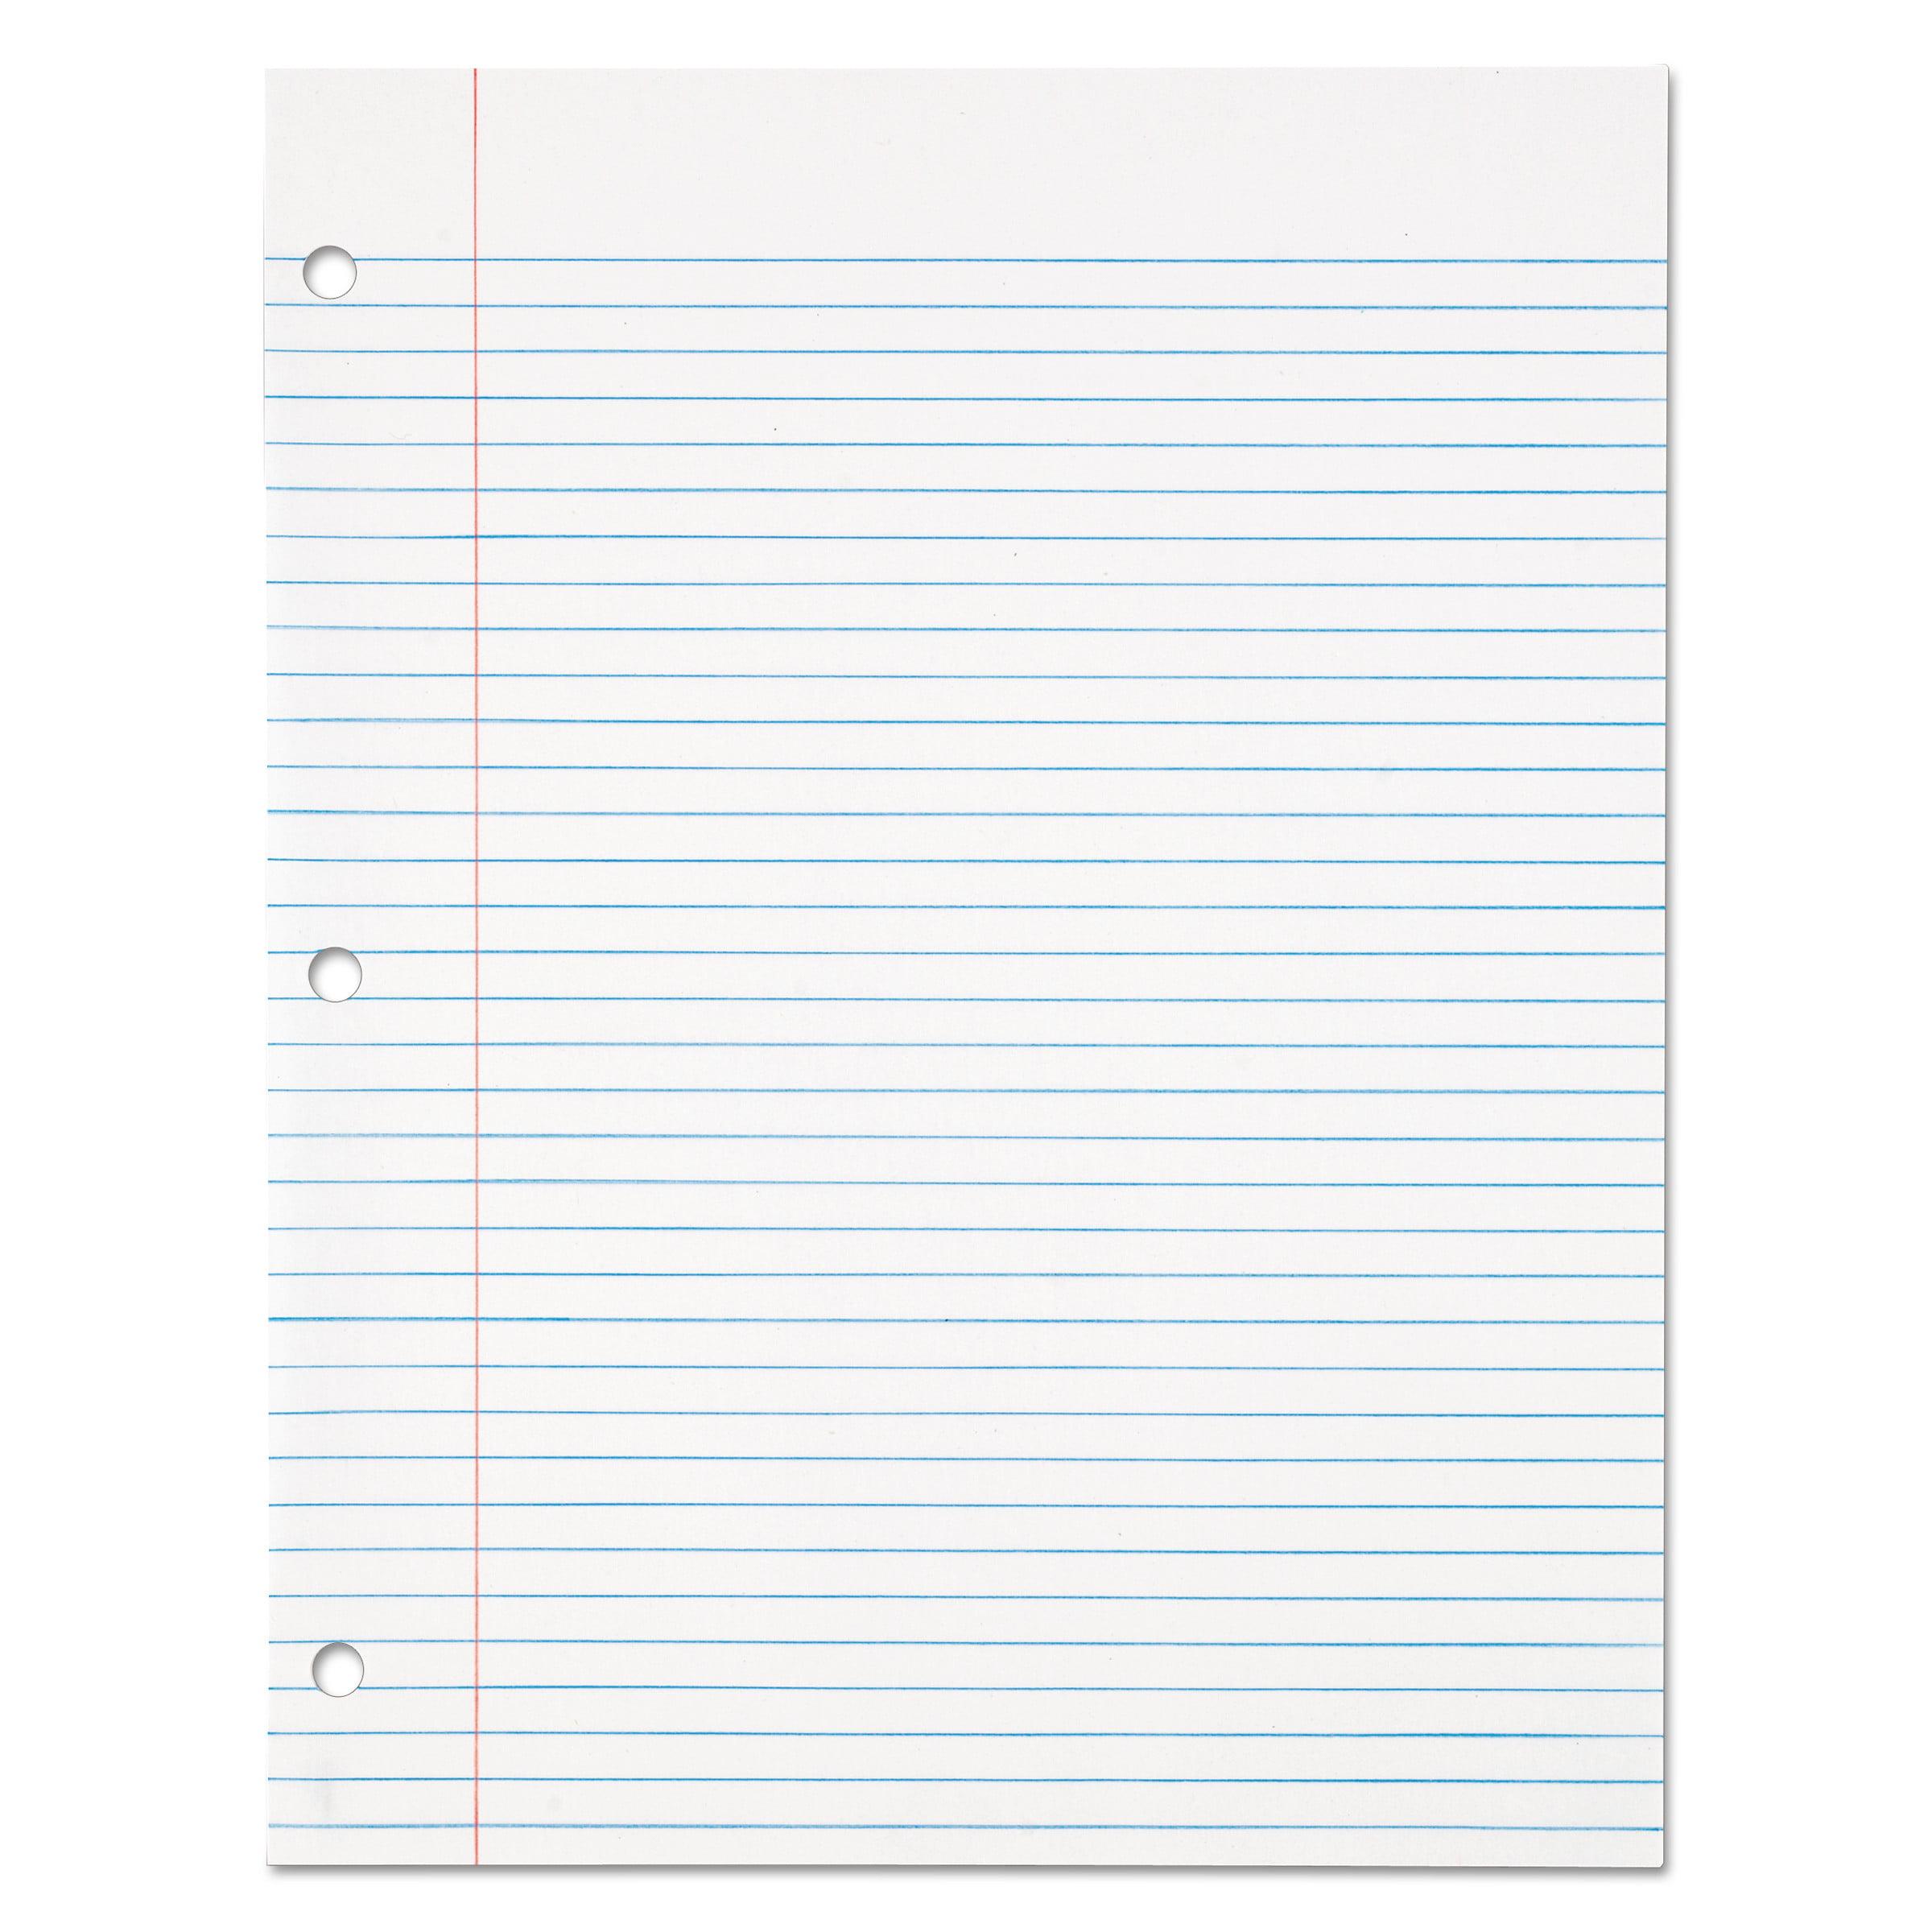 TOPS Filler Paper, 3H, 16 lb, 8 1/2 x 11, College Rule, White, 500 Sh/Pack